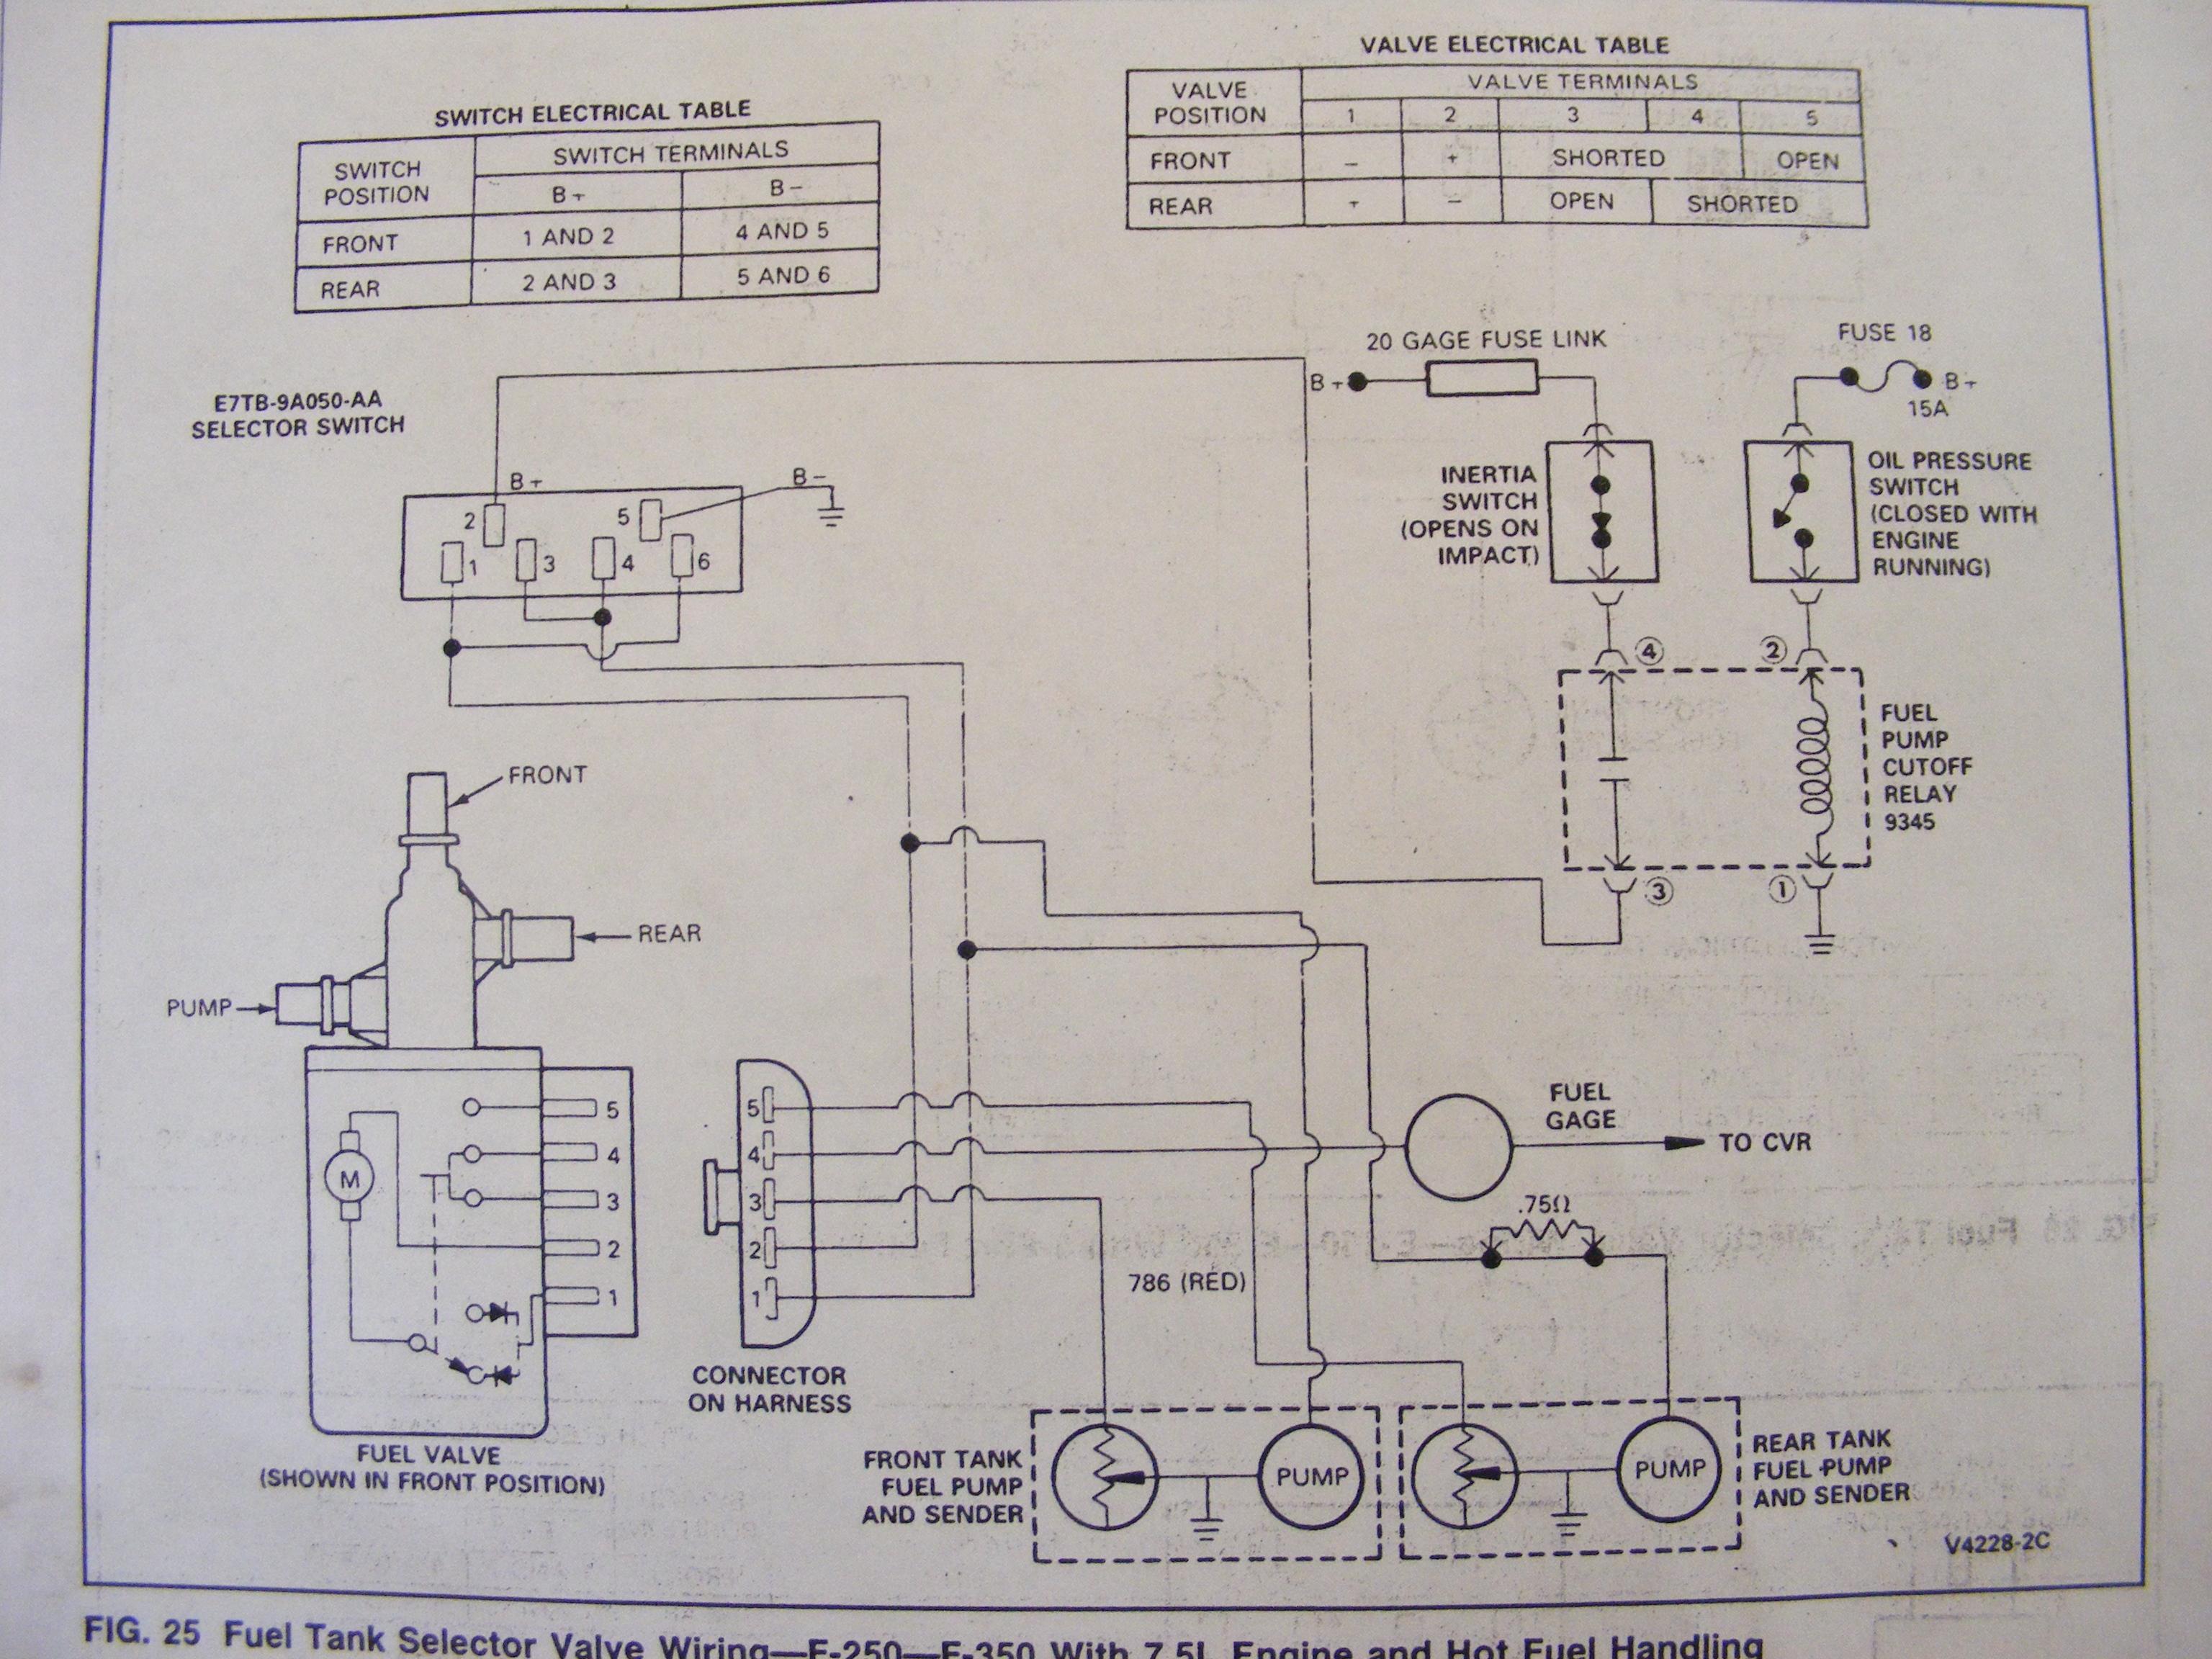 [DIAGRAM_5LK]  1983 Coachmen Wiring Diagram North Star Polaris Wiring Diagram Heated Seats  - air-bag.anggur.astrea-construction.fr   1983 Ford E 350 Wiring Harness      ASTREA CONSTRUCTION